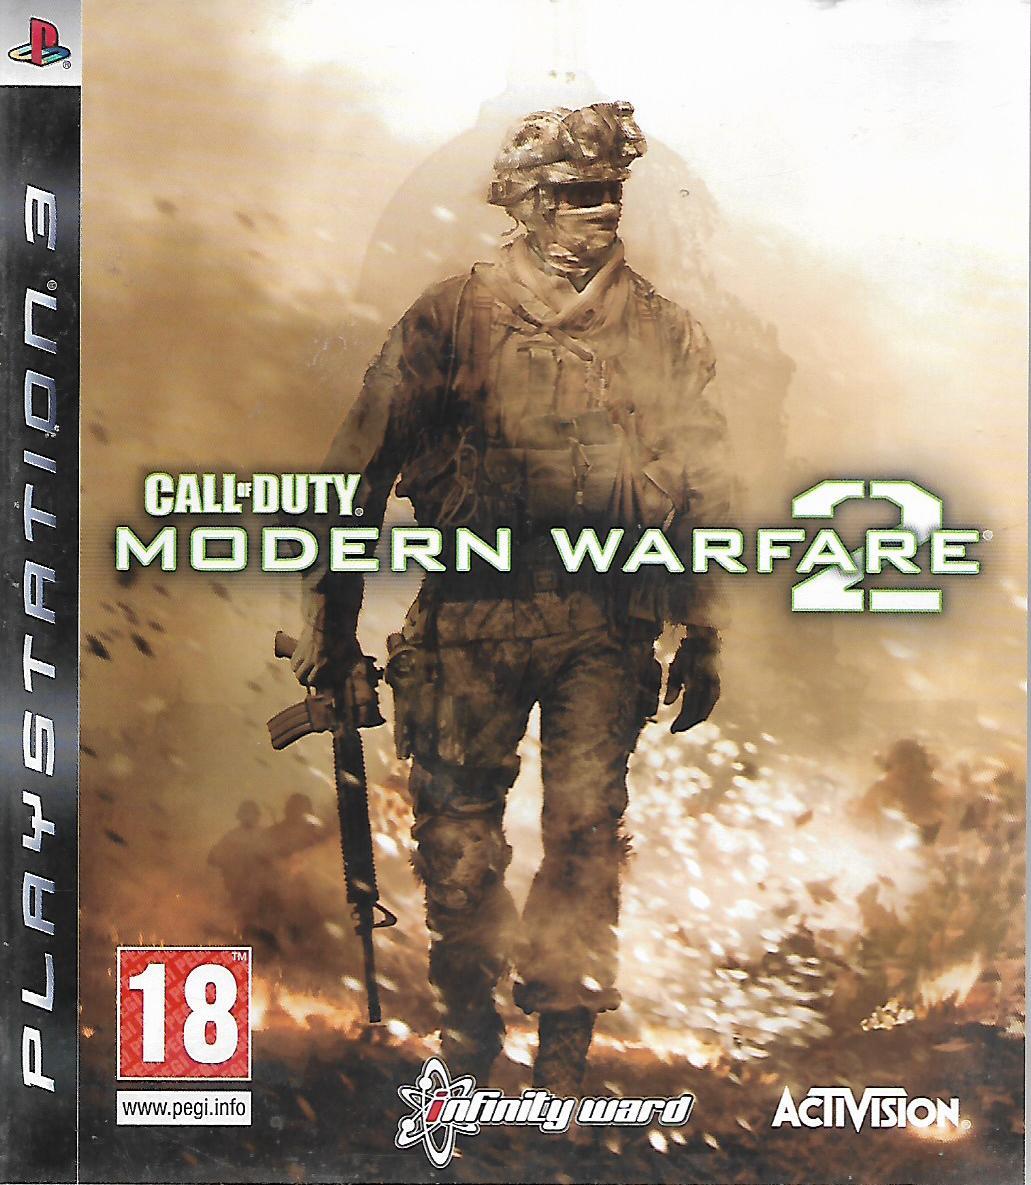 CALL OF DUTY - MODERN WARFARE 2 (PS3 - bazar)